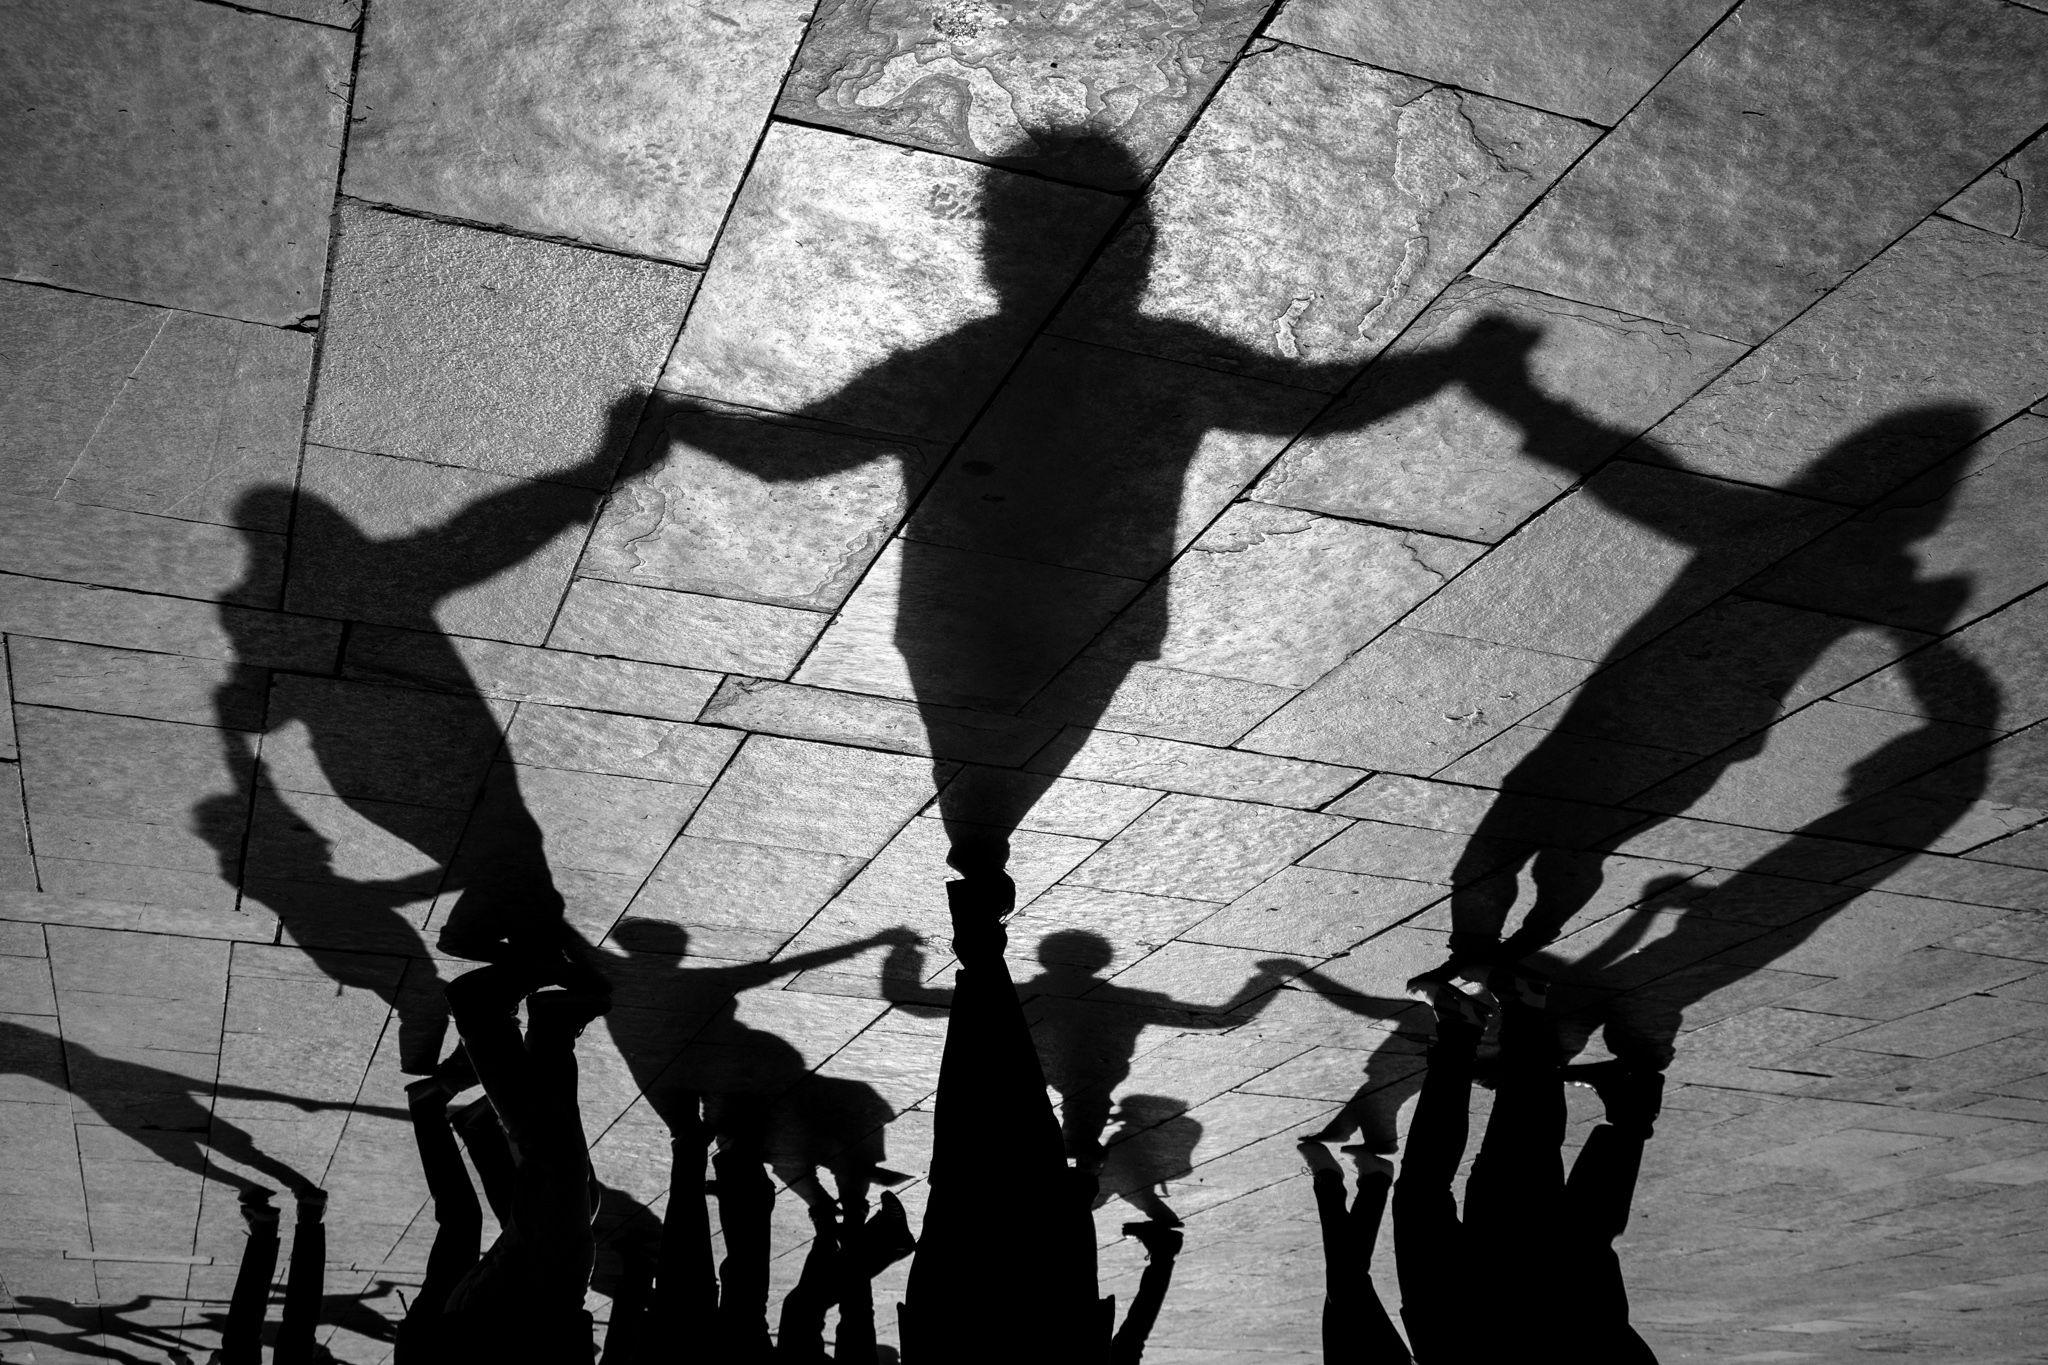 Ballada de sardanes a la plaça Octavià. FOTO: Ale Gómez